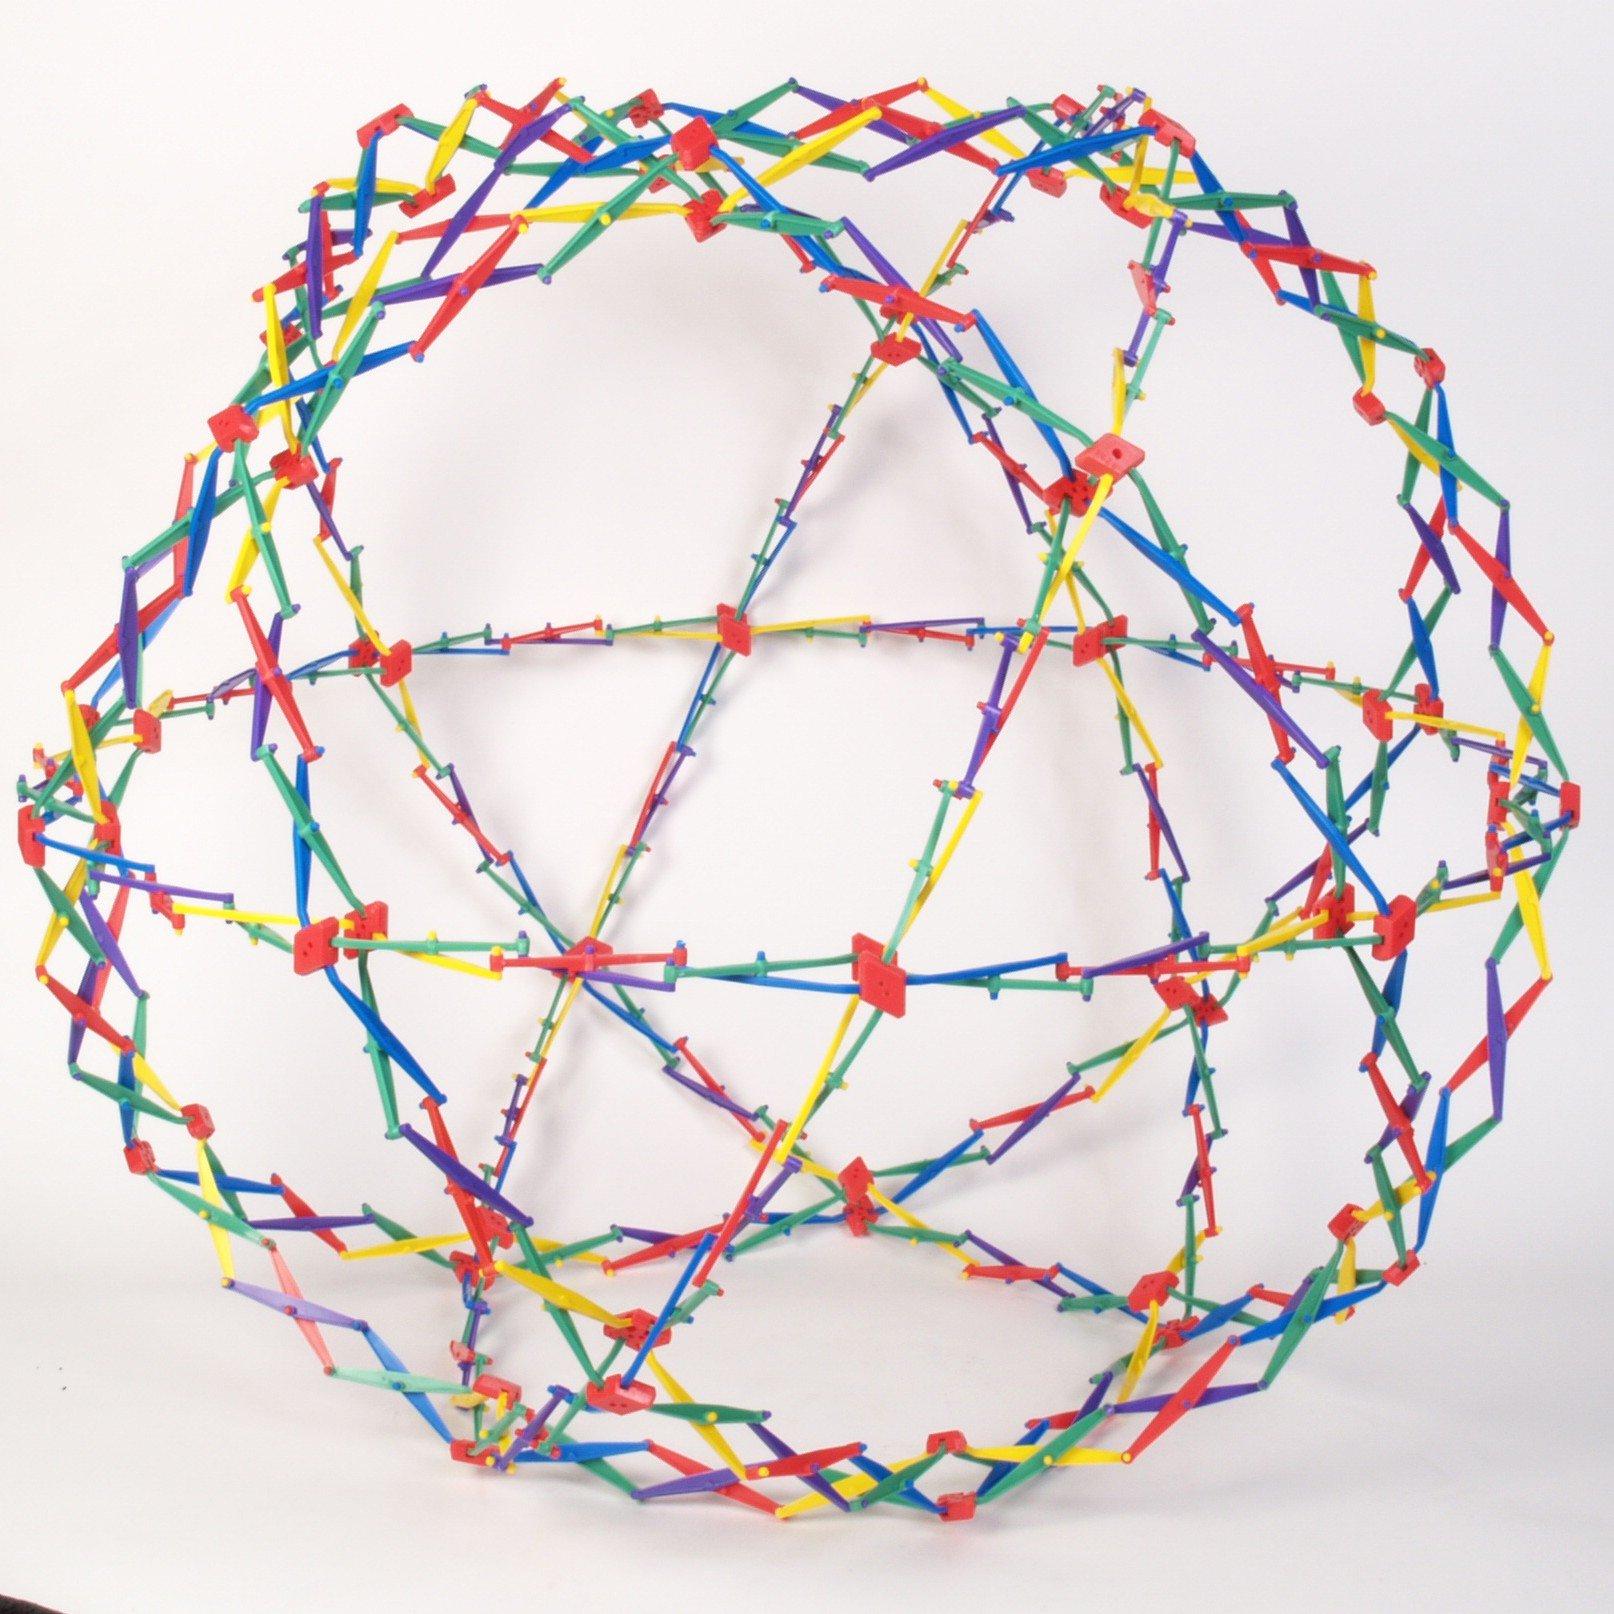 Original Hoberman Sphere--Rainbow (Discontinued by manufacturer) by Hoberman (Image #2)